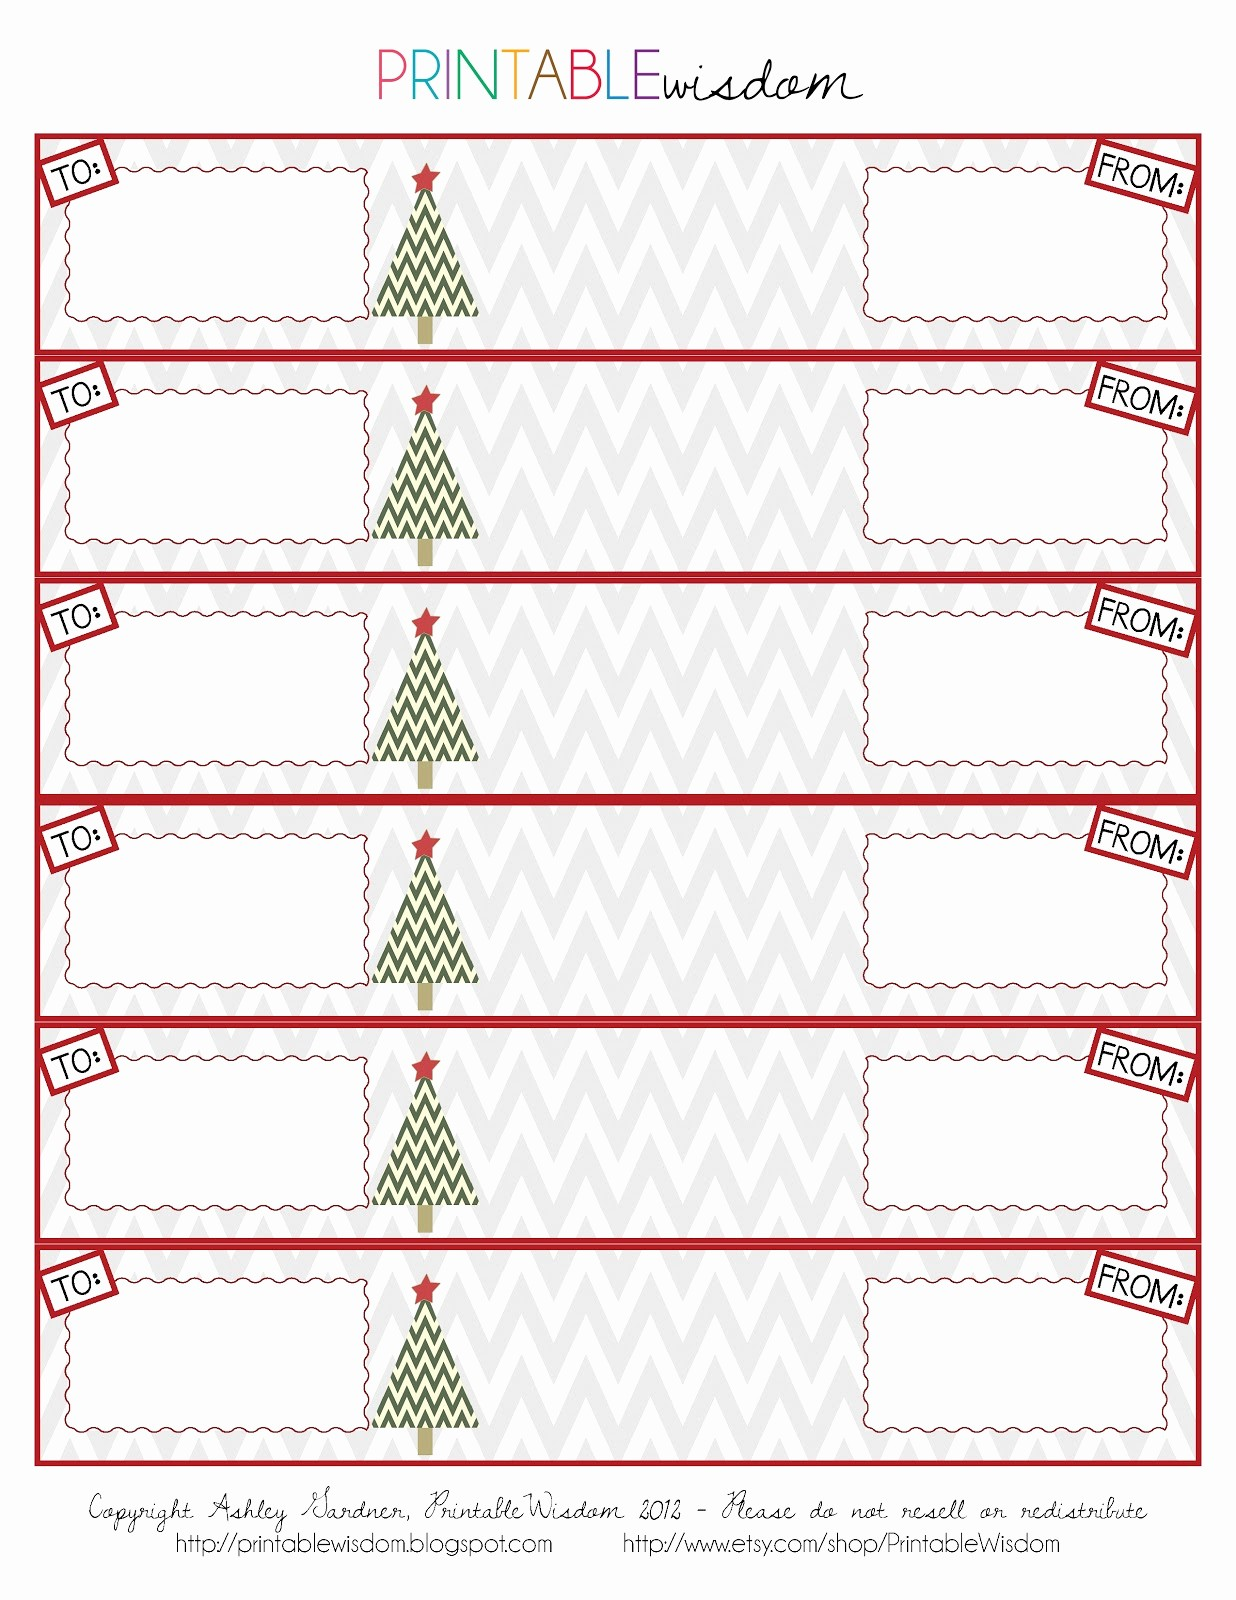 Christmas Mailing Labels Template Free Luxury Free Printable Christmas Address Labels thebridgesummit